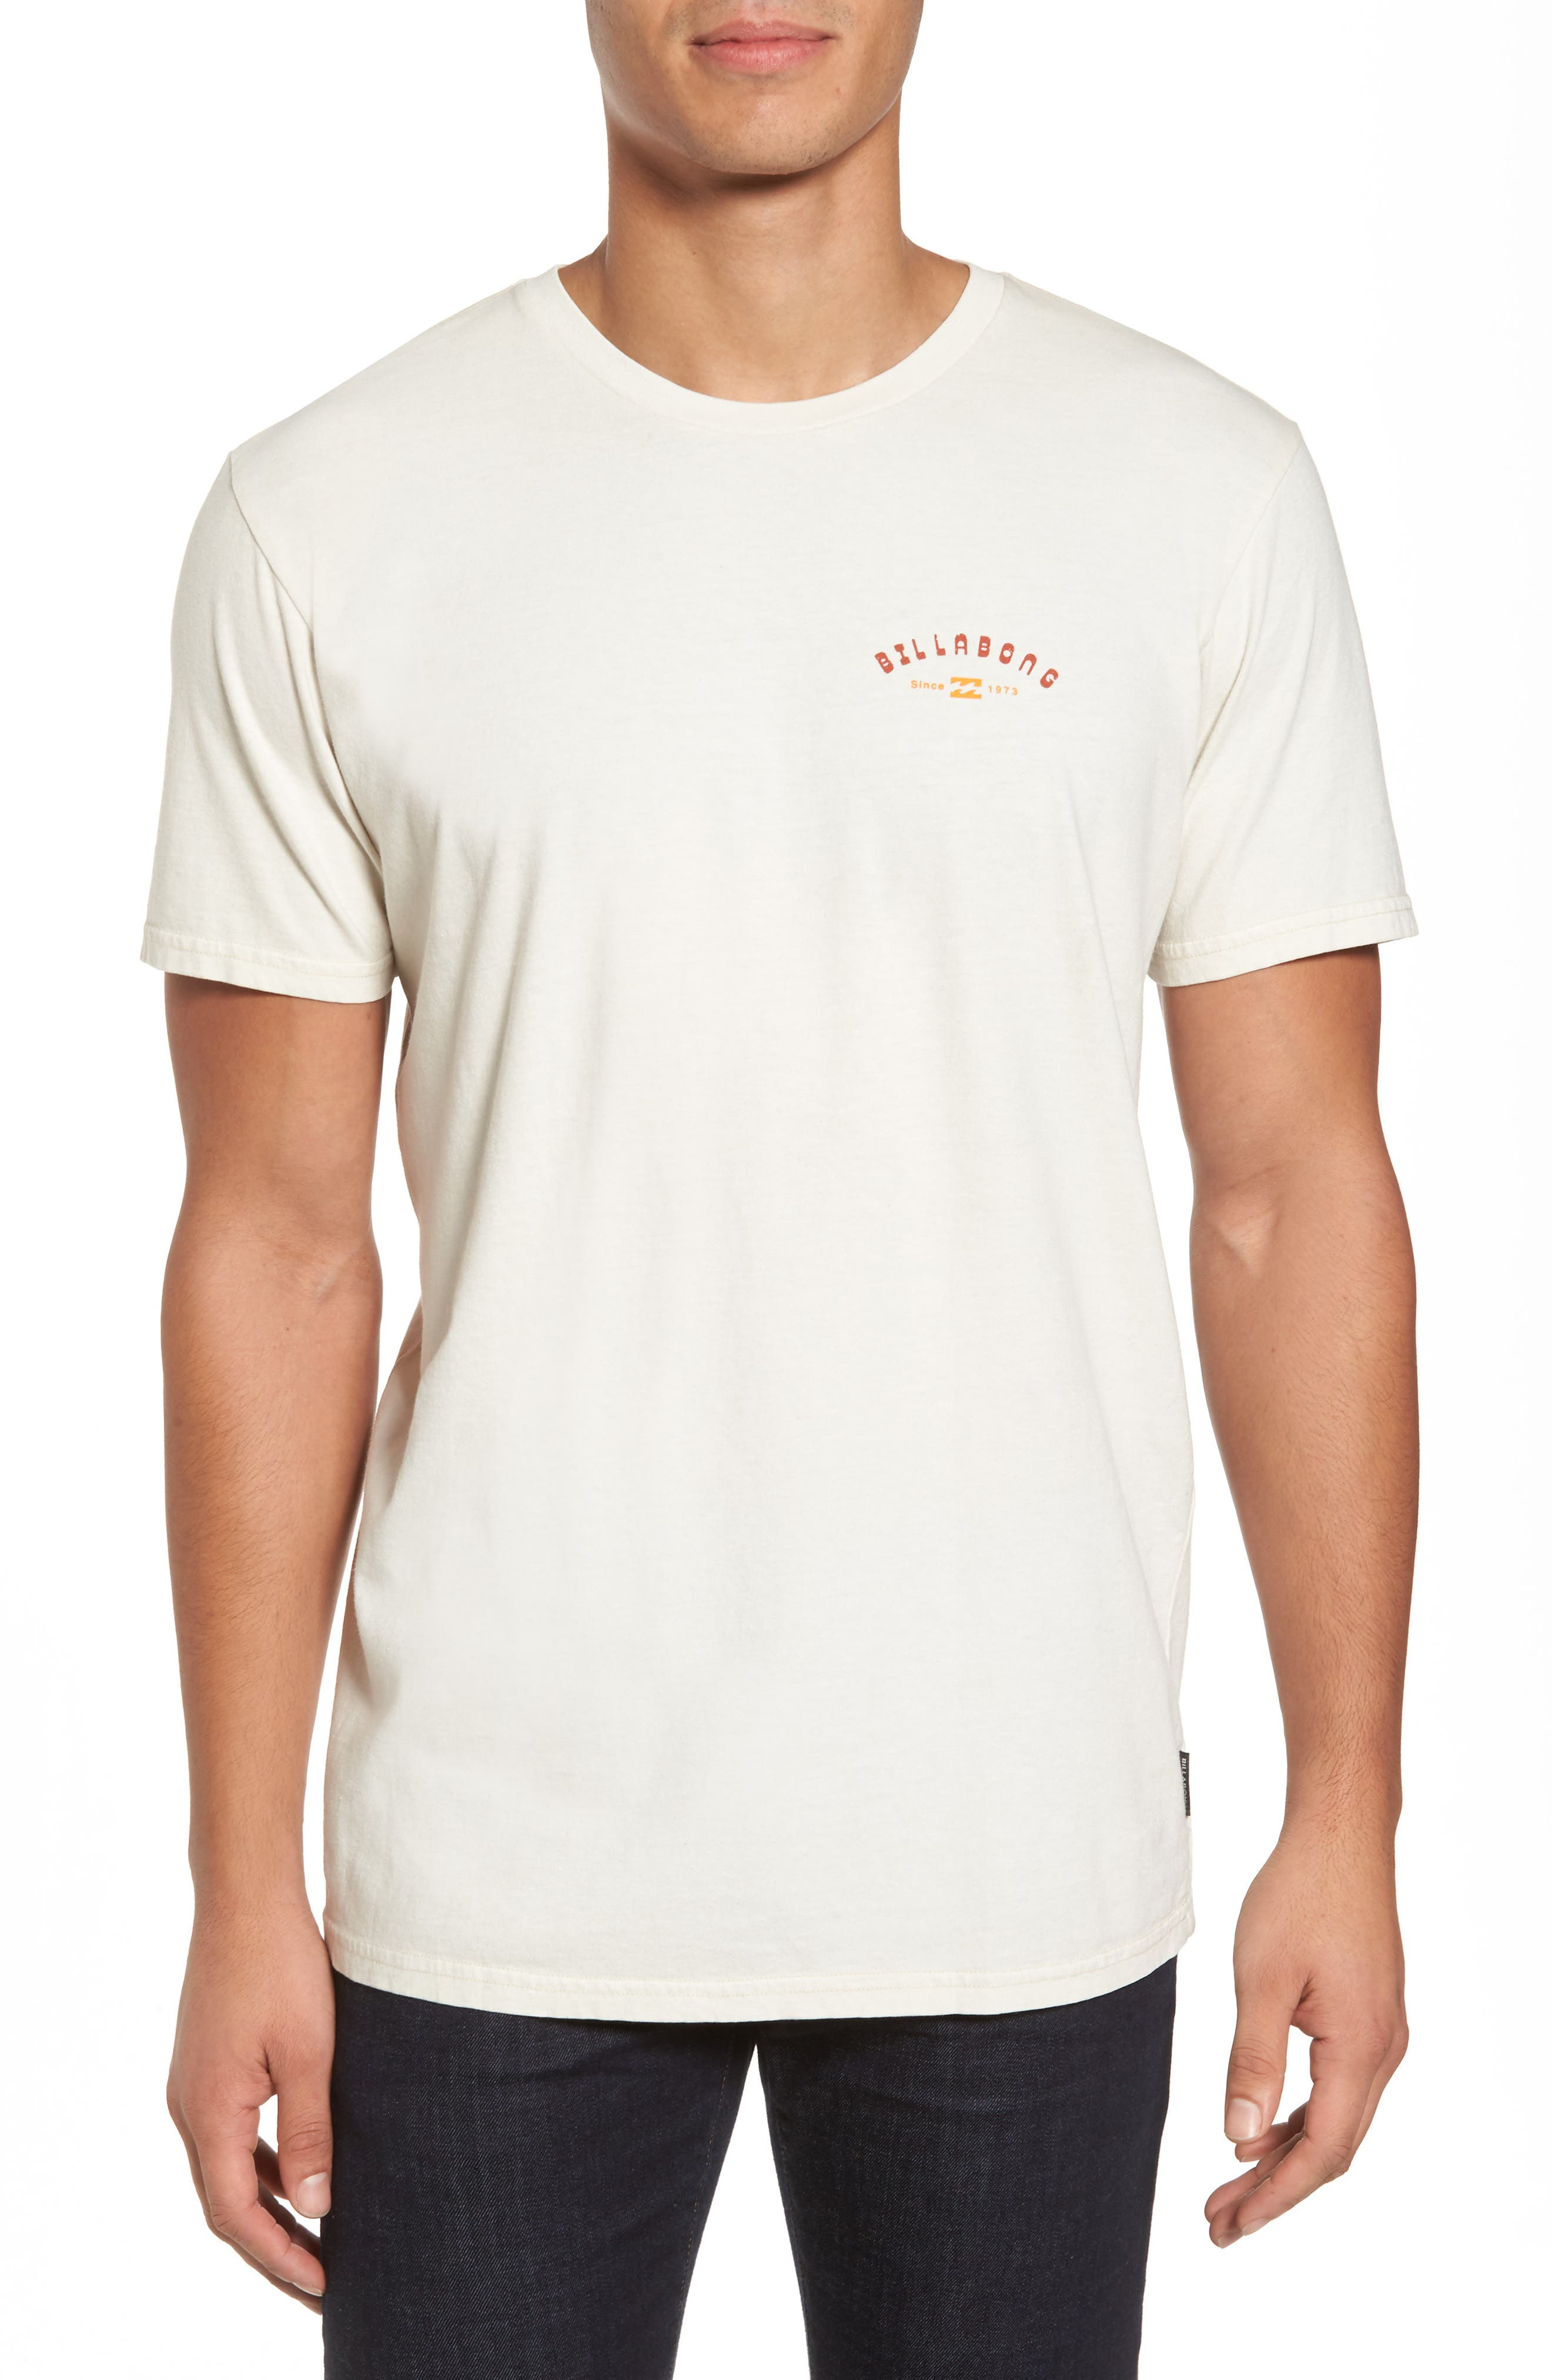 Alternate Image 1 Selected - Billabong Single Fin Graphic T-Shirt